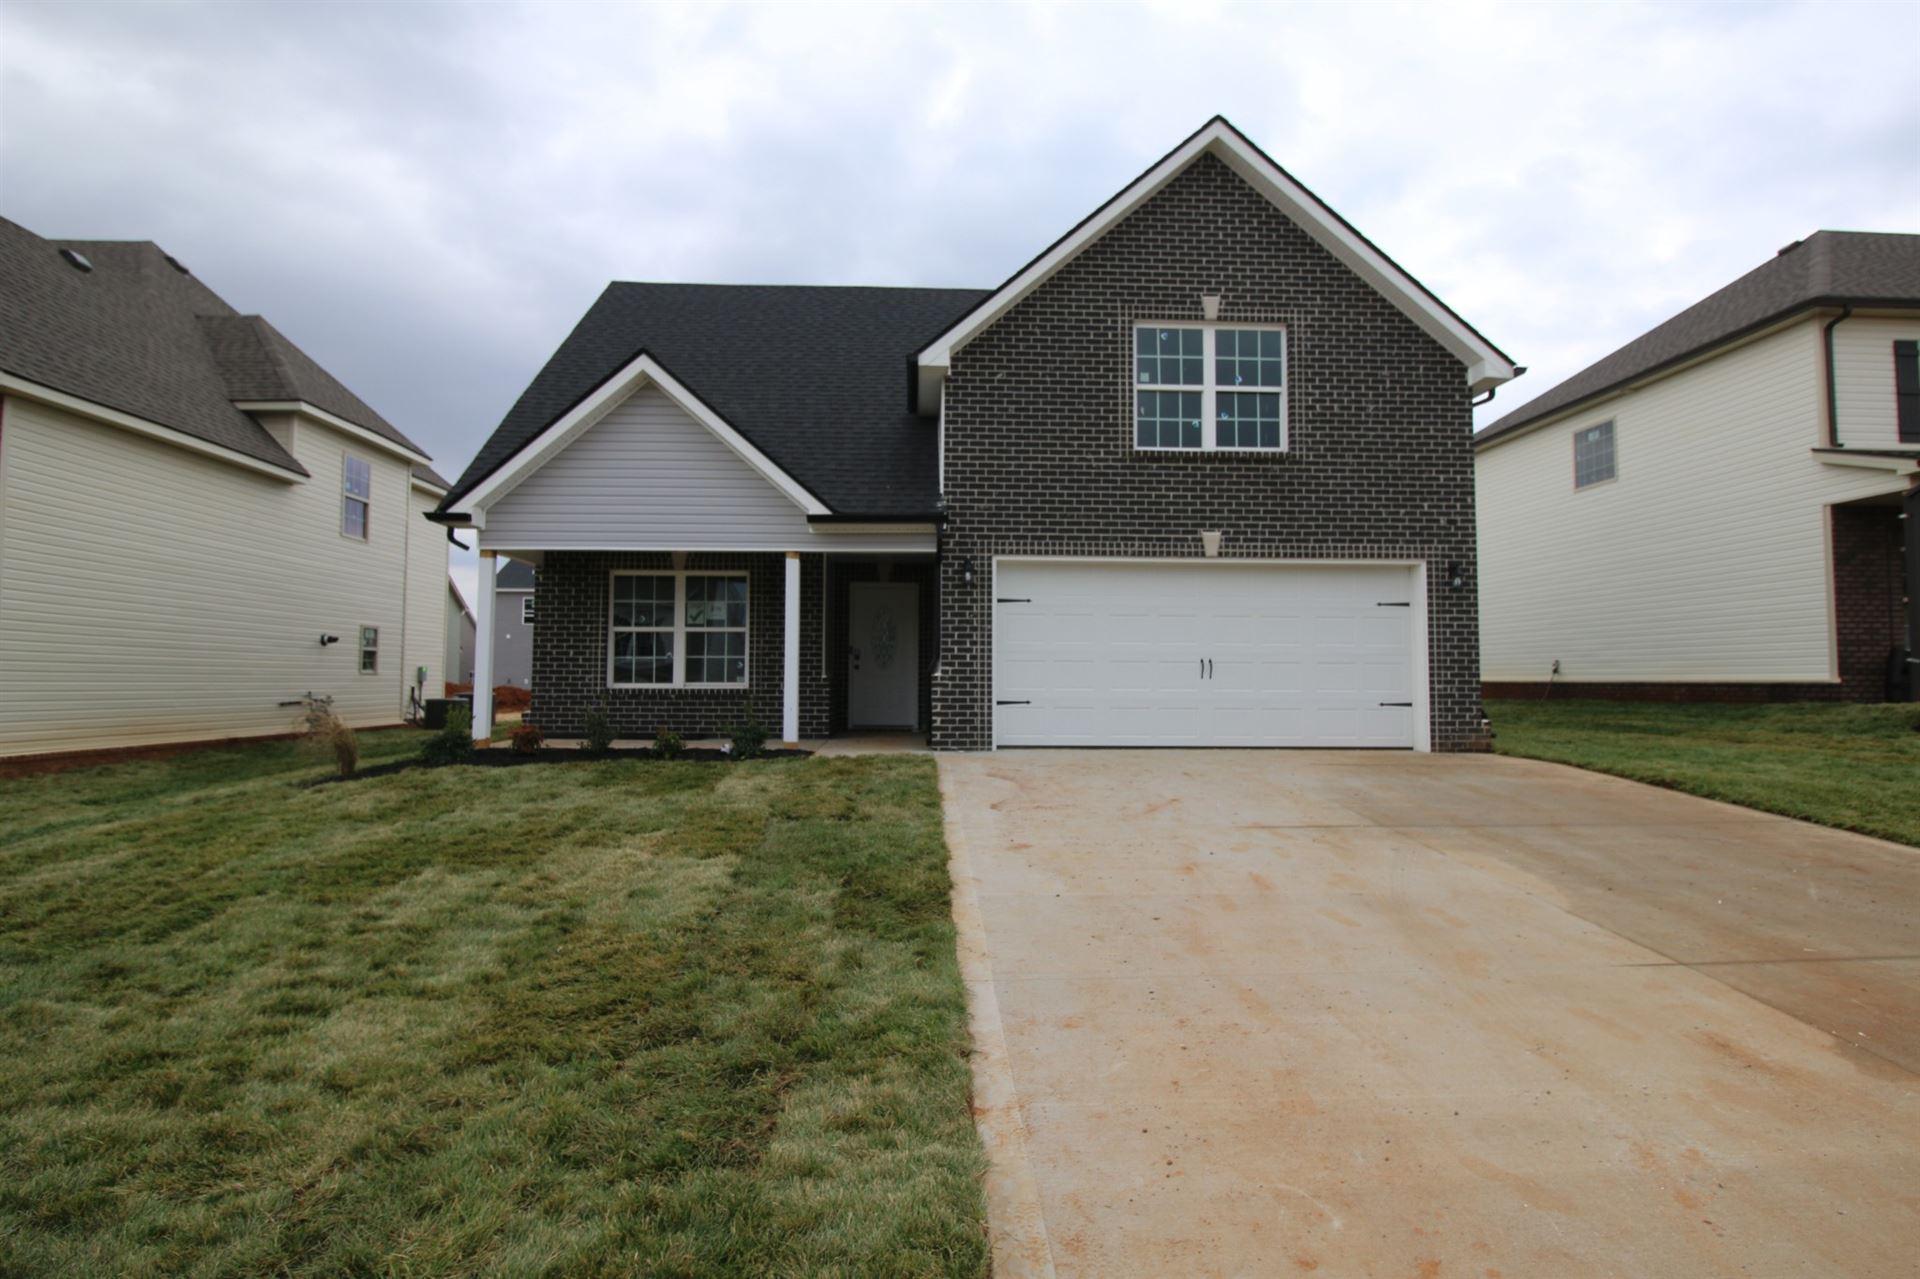 378 Summerfield, Clarksville, TN 37040 - MLS#: 2287931